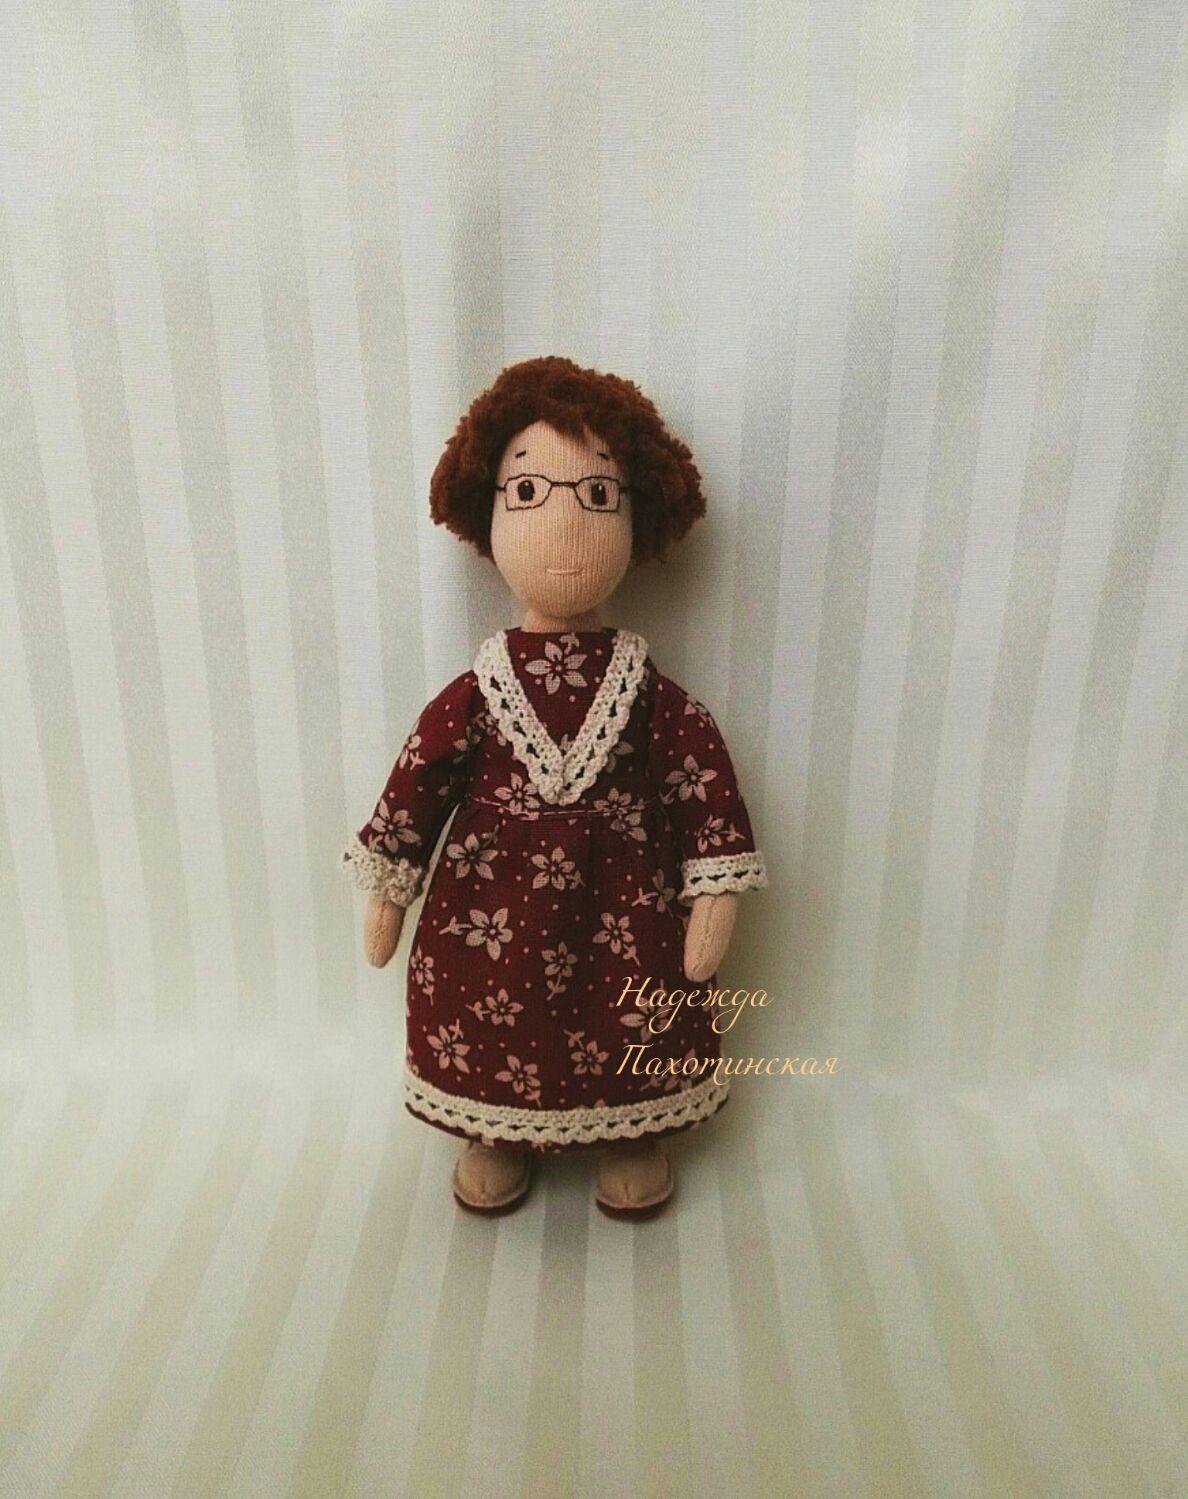 Куколка - молодая бабушка, Вальдорфские куклы и звери, Долгопрудный,  Фото №1